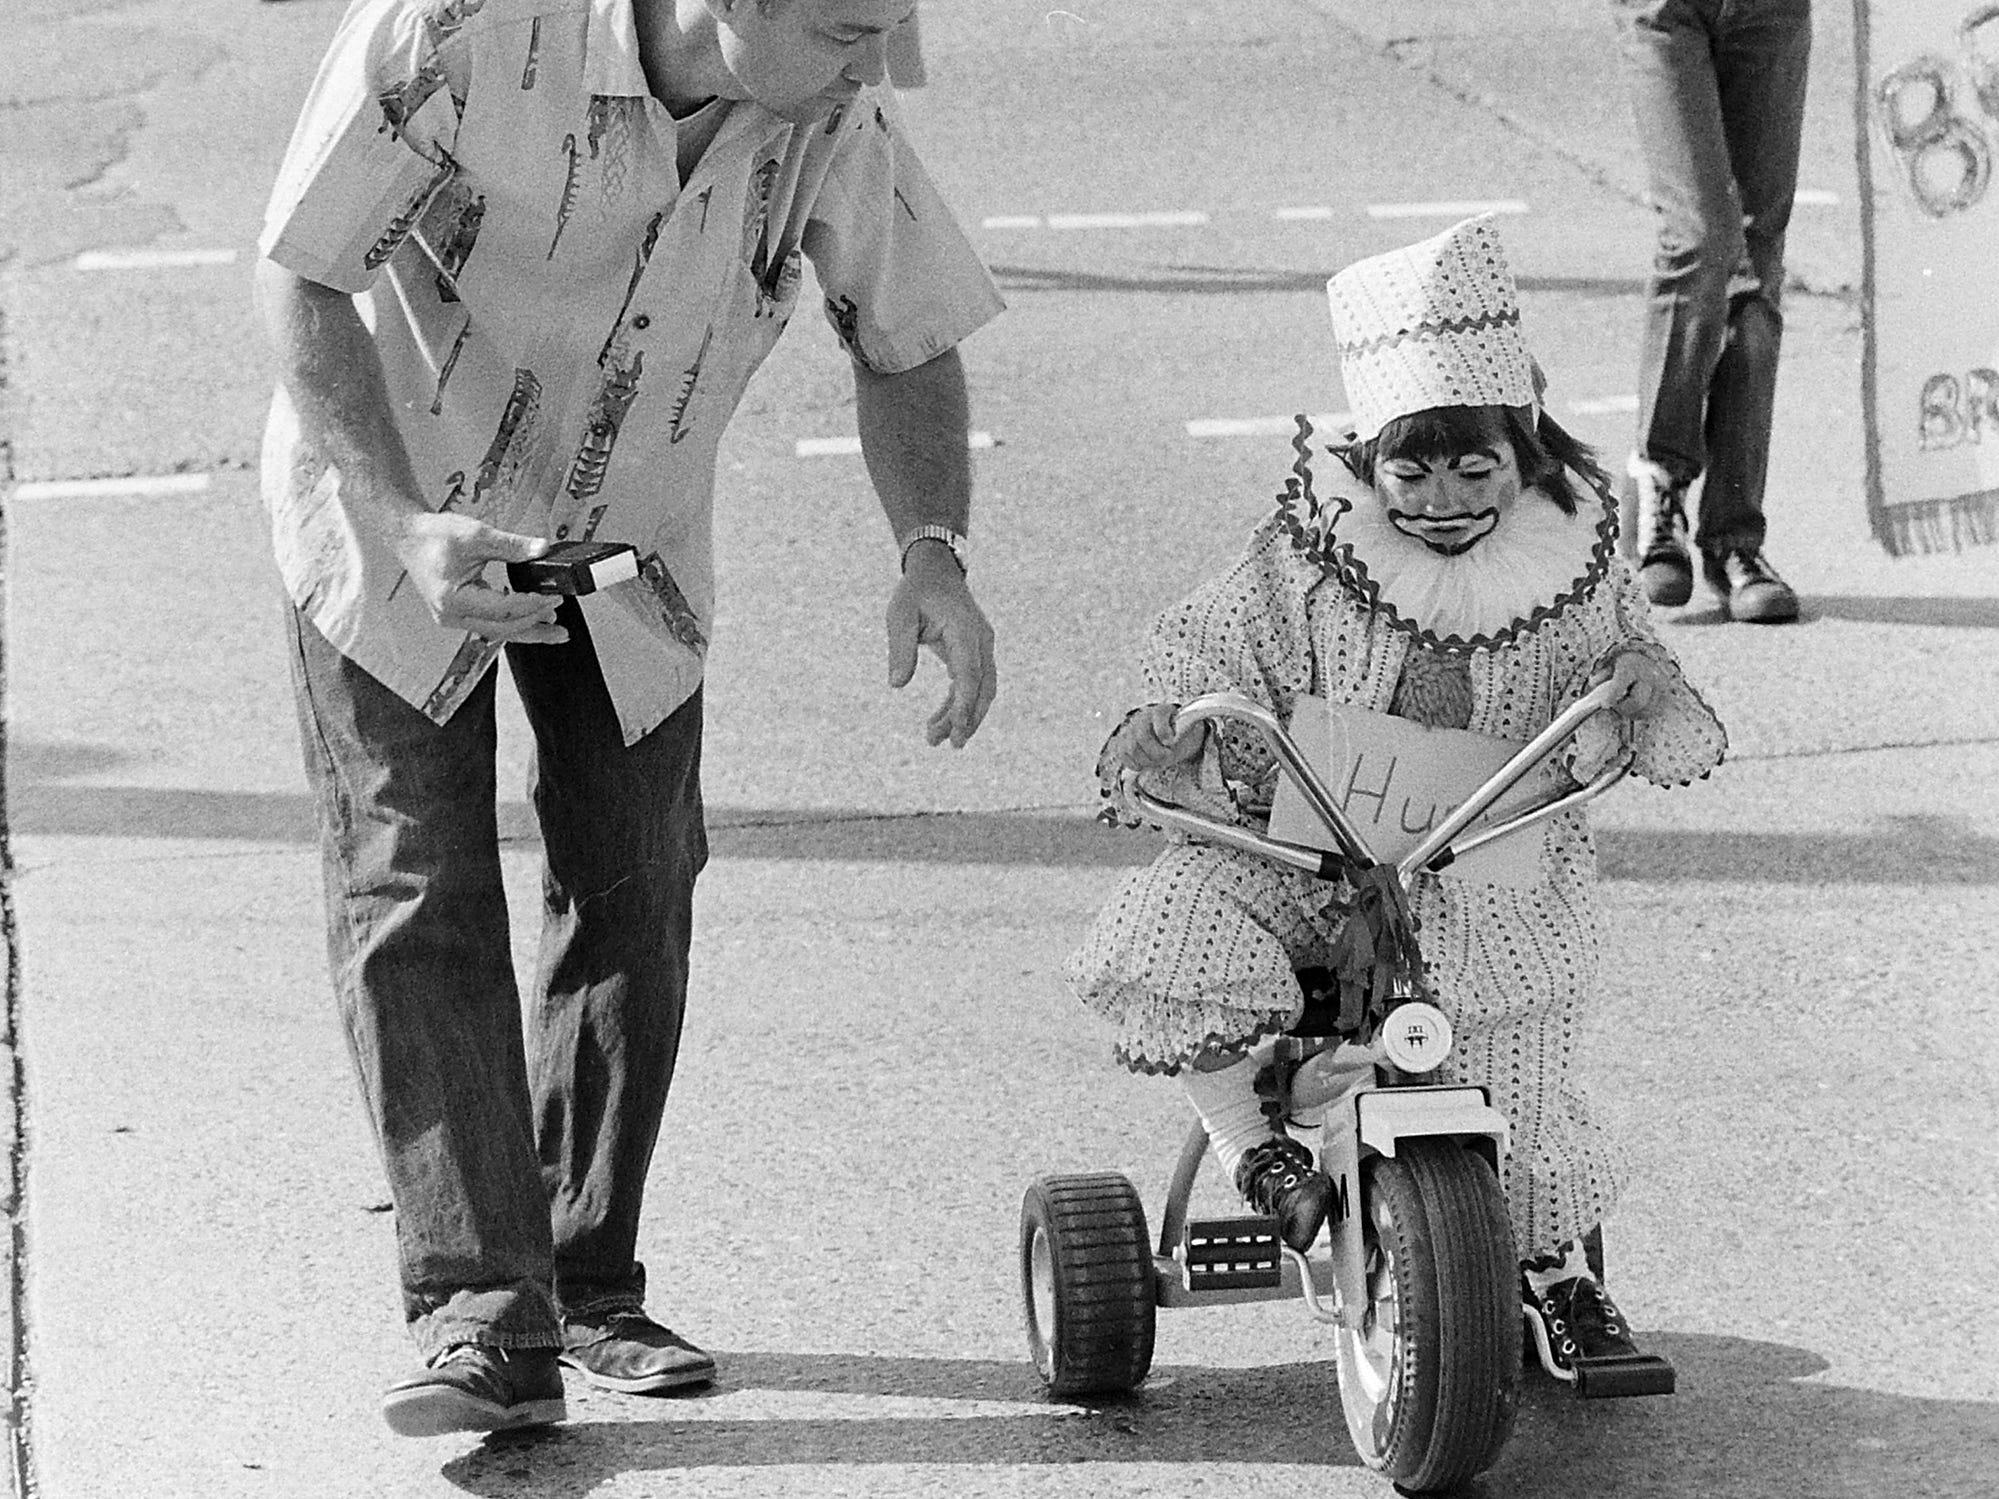 08/22/73Kids Parade